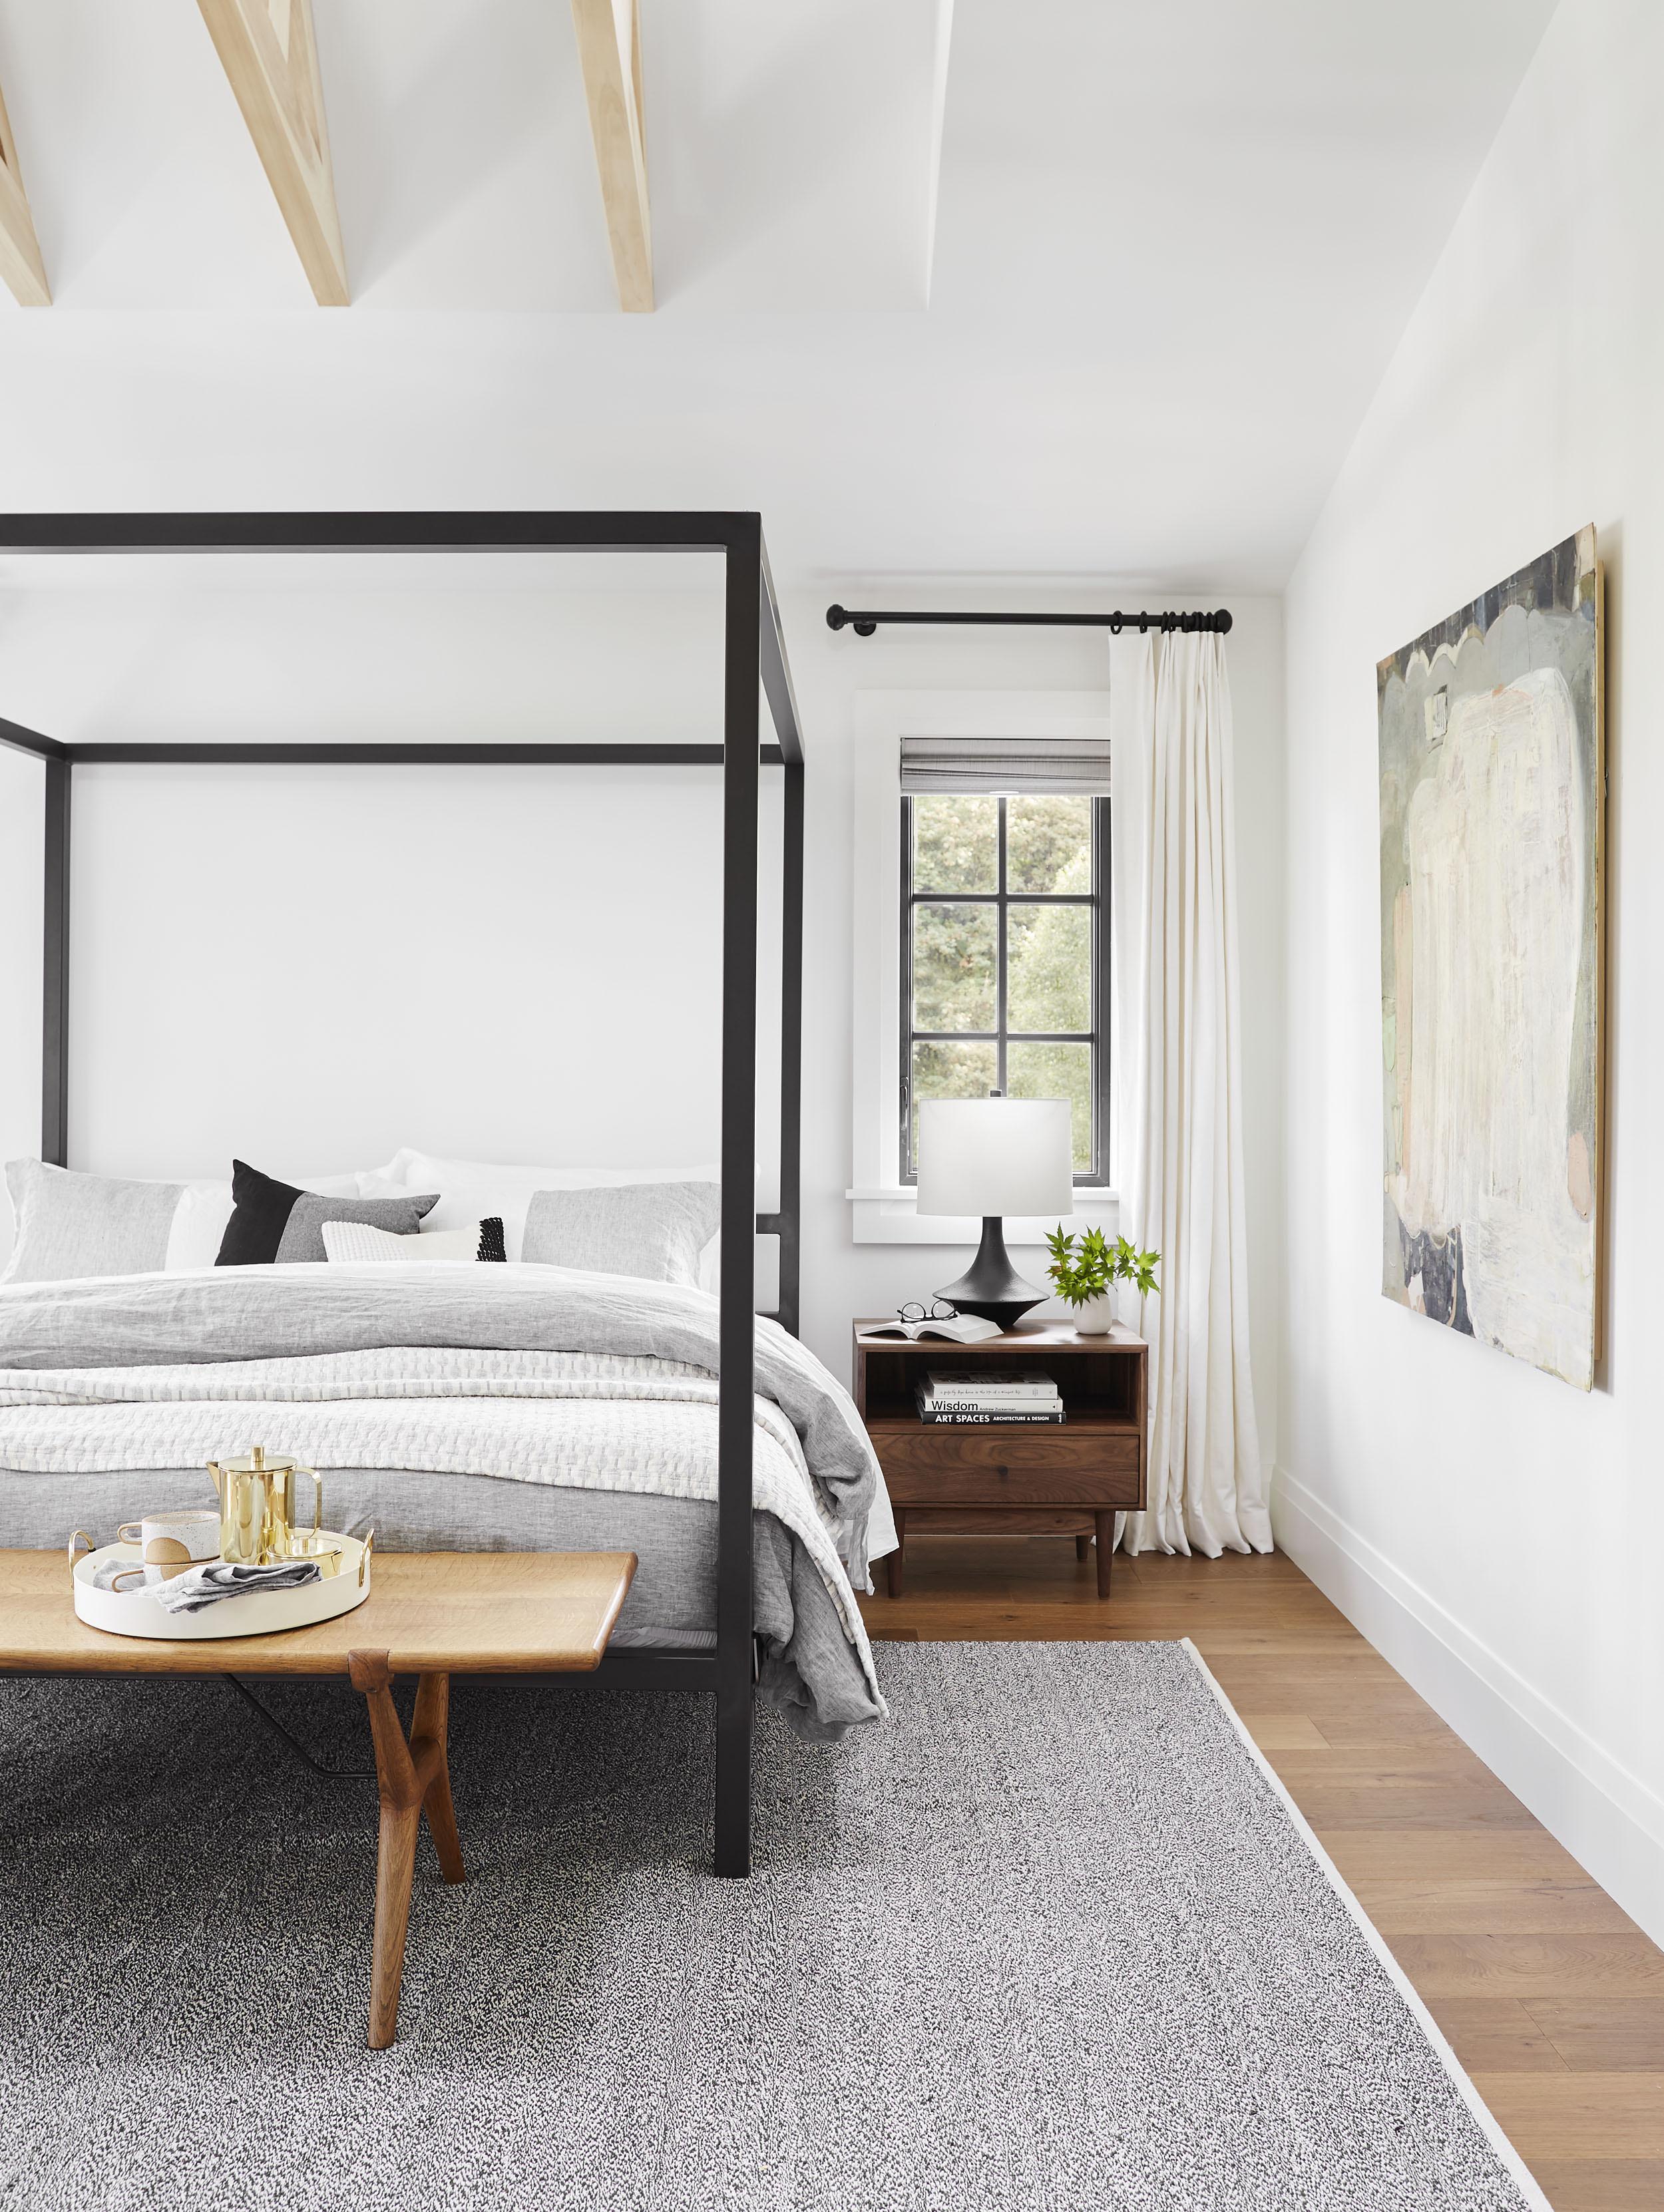 Interior Design:  Emily Henderson